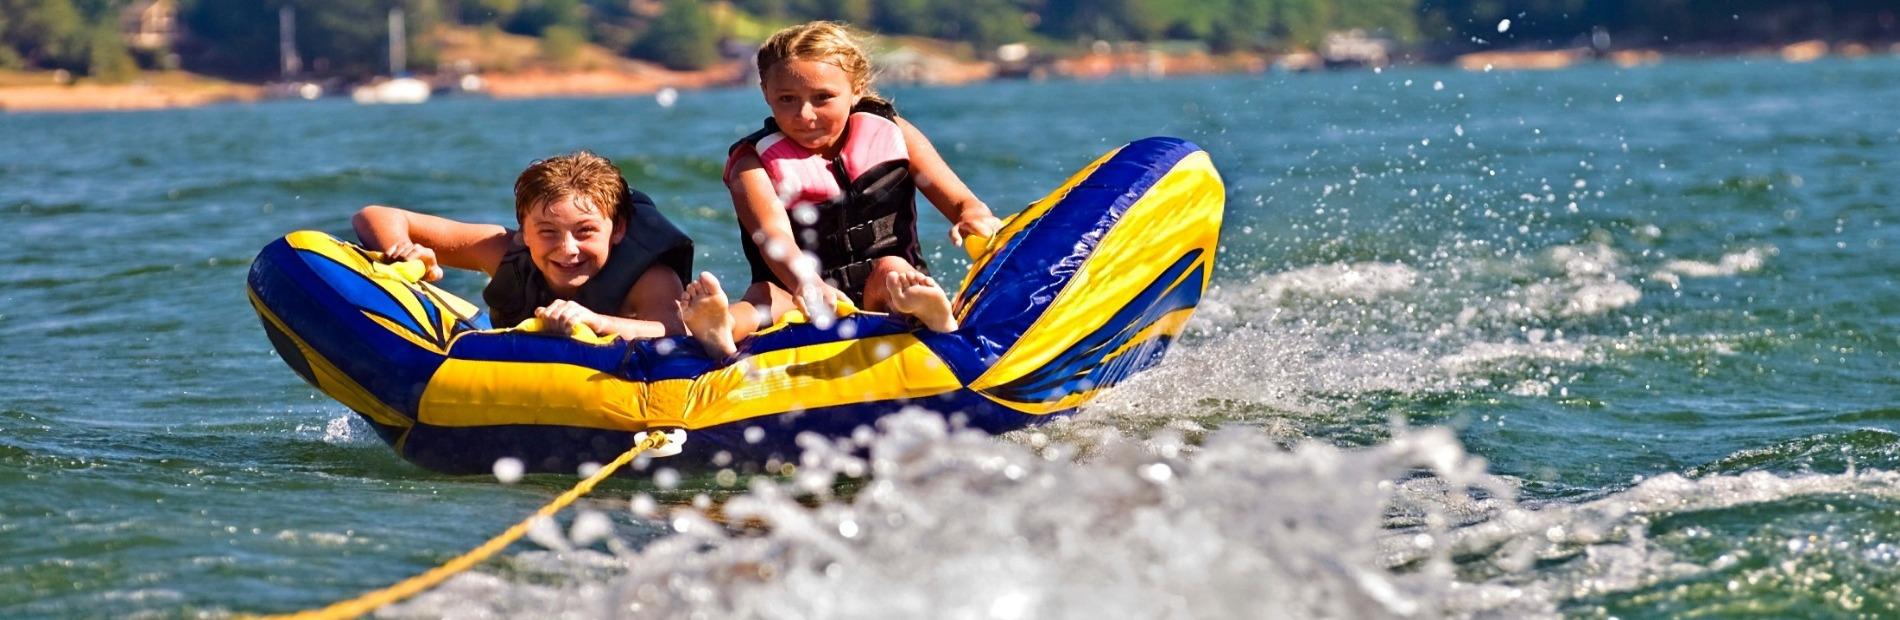 Summer Camps - Water Fun